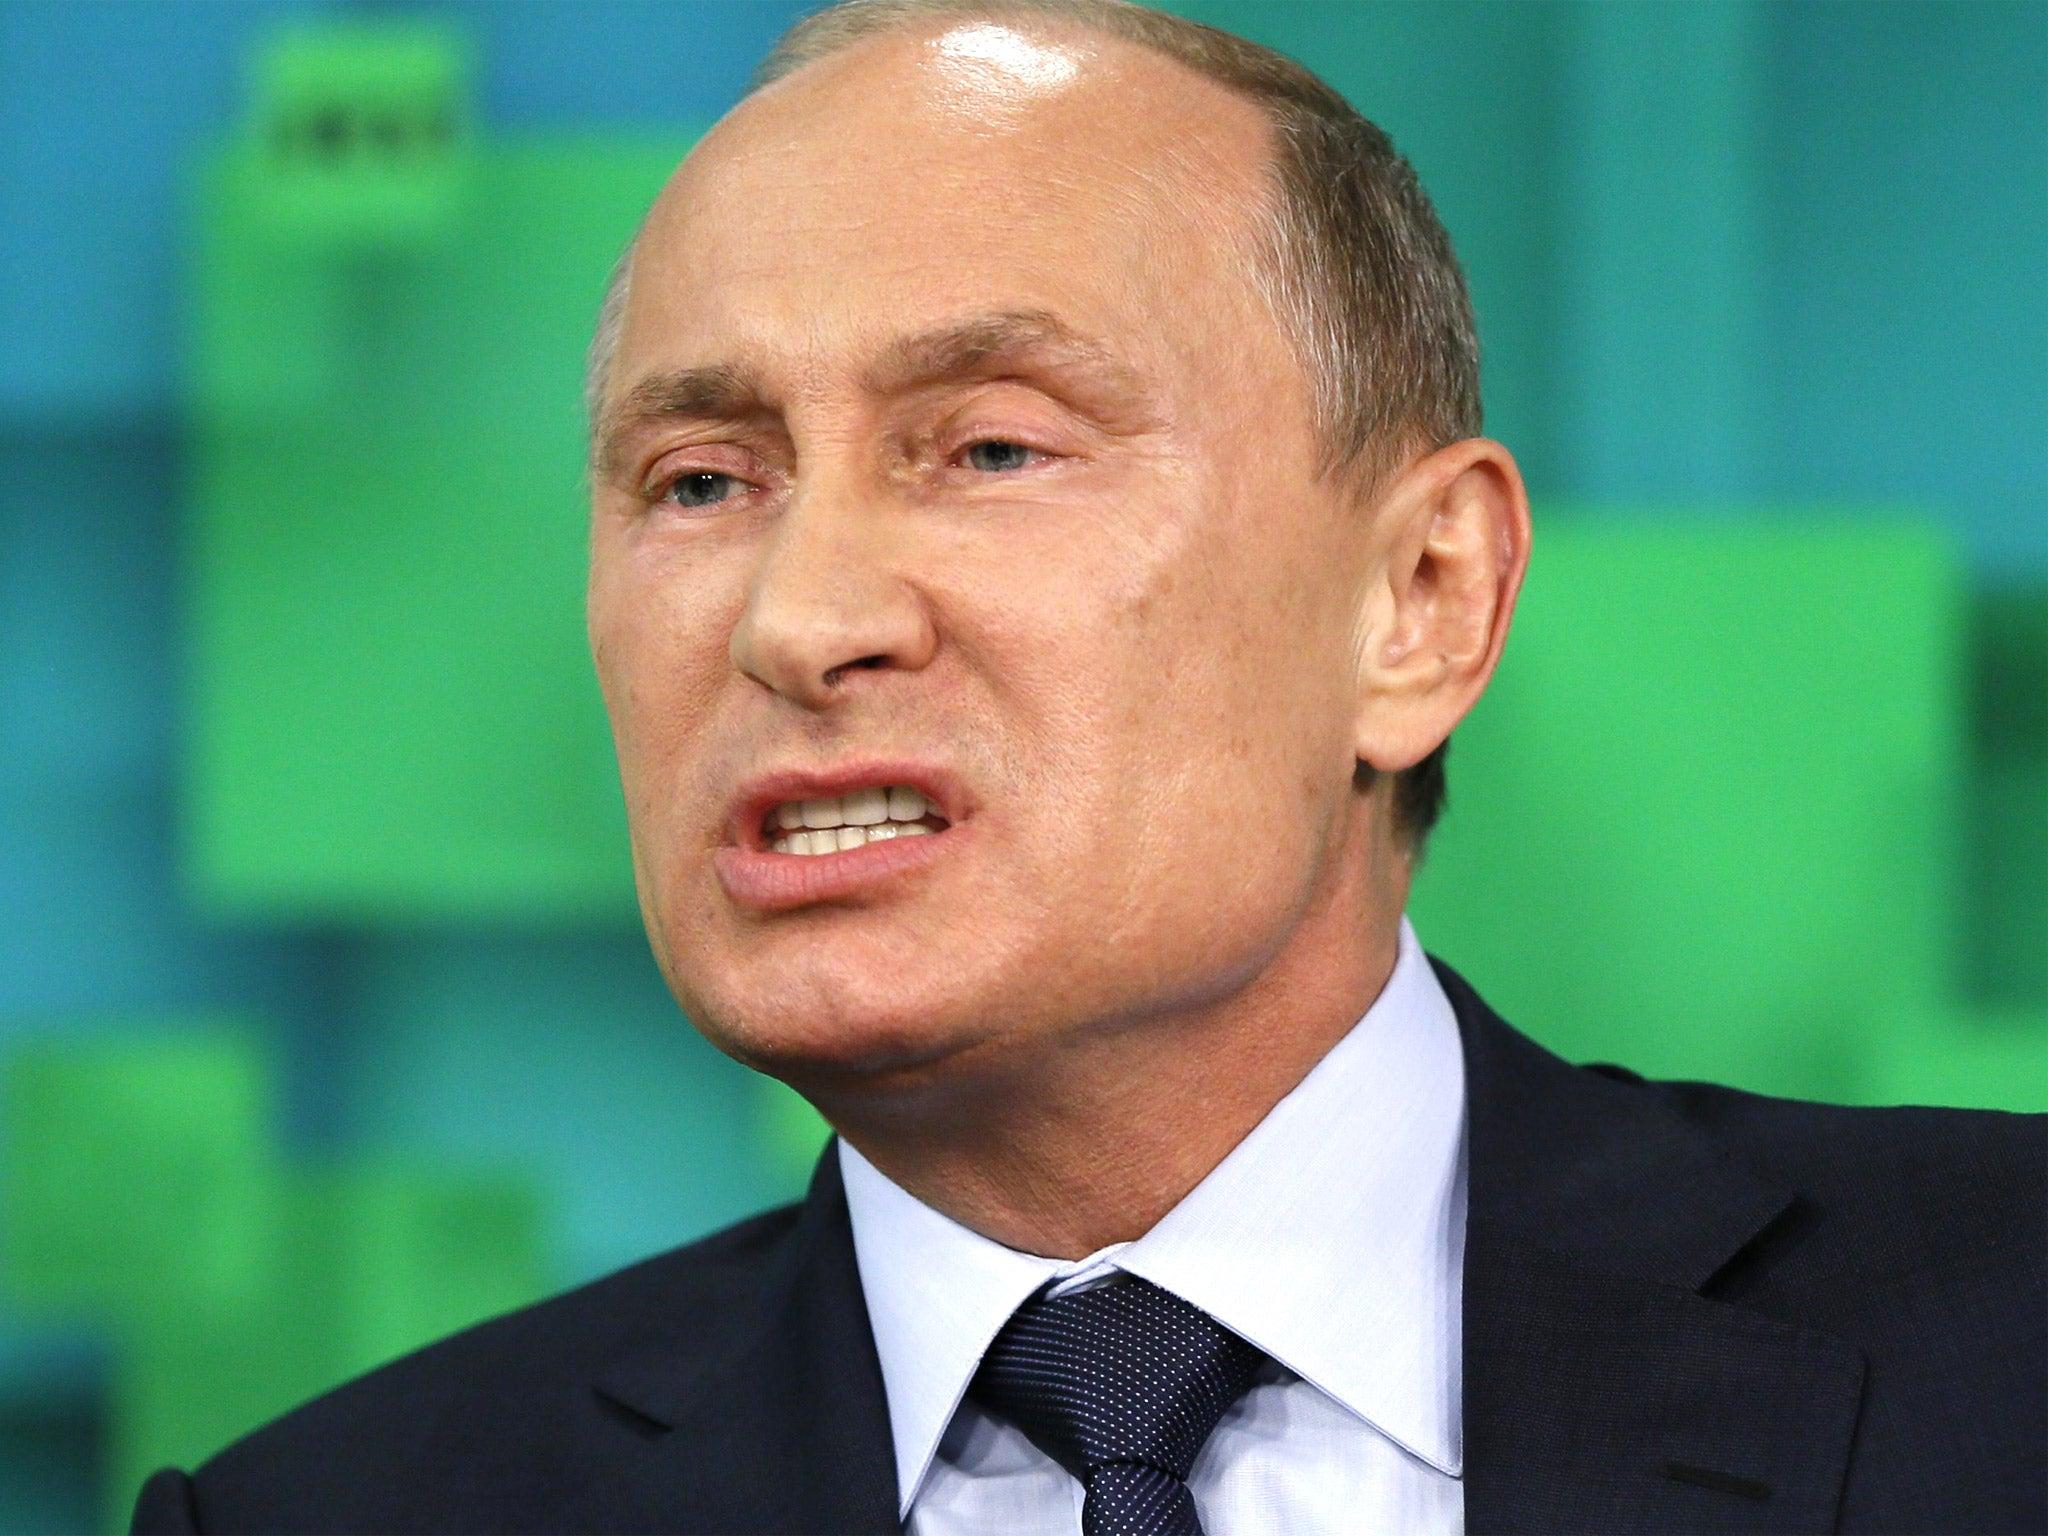 kremlin sex chat 🍆 sex 🙏 religion 🍰 food 🚬 drugs  help chat alphabetical list kremlin dusk kremlin effect  kreepydench - krench.